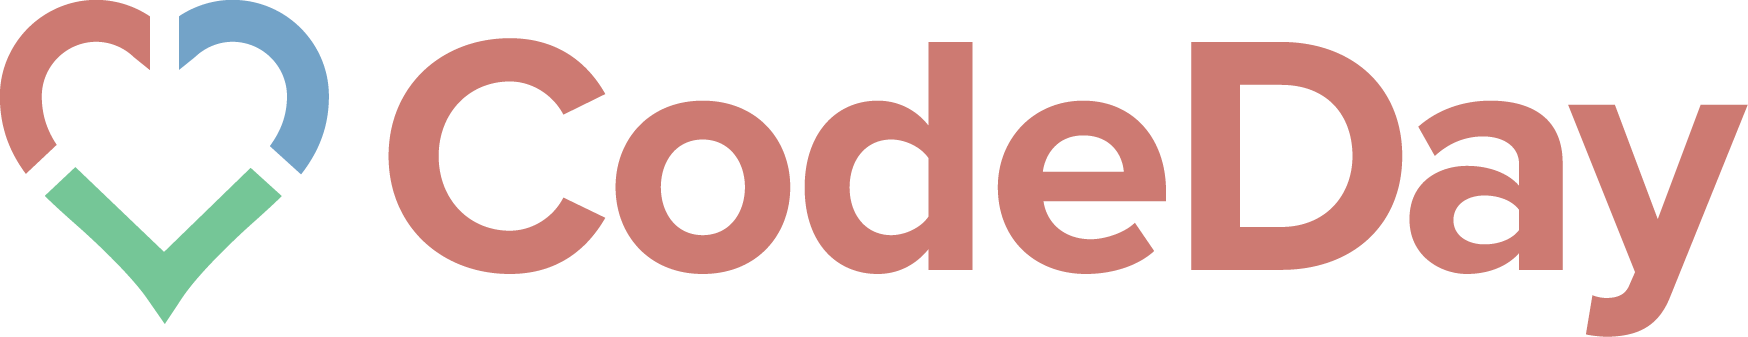 codeday_logo.png